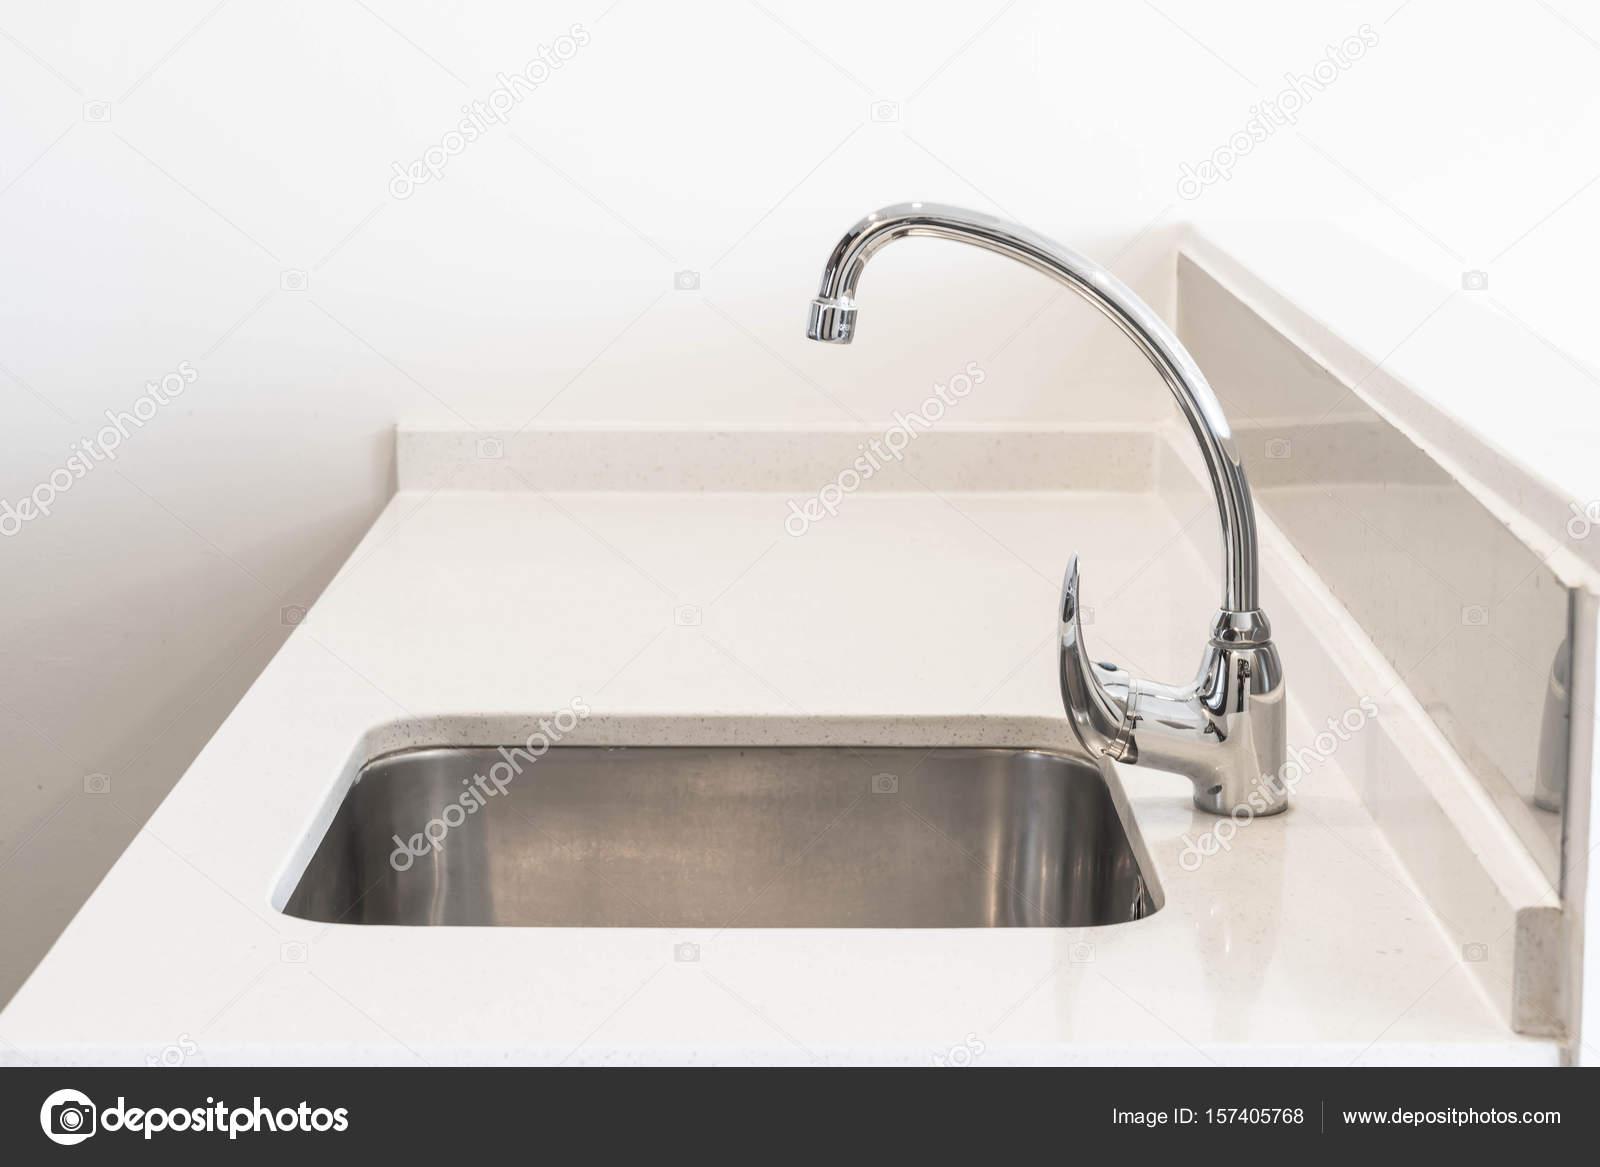 Kraan wastafel en water tab decoratie in de keuken kamer u2014 stockfoto